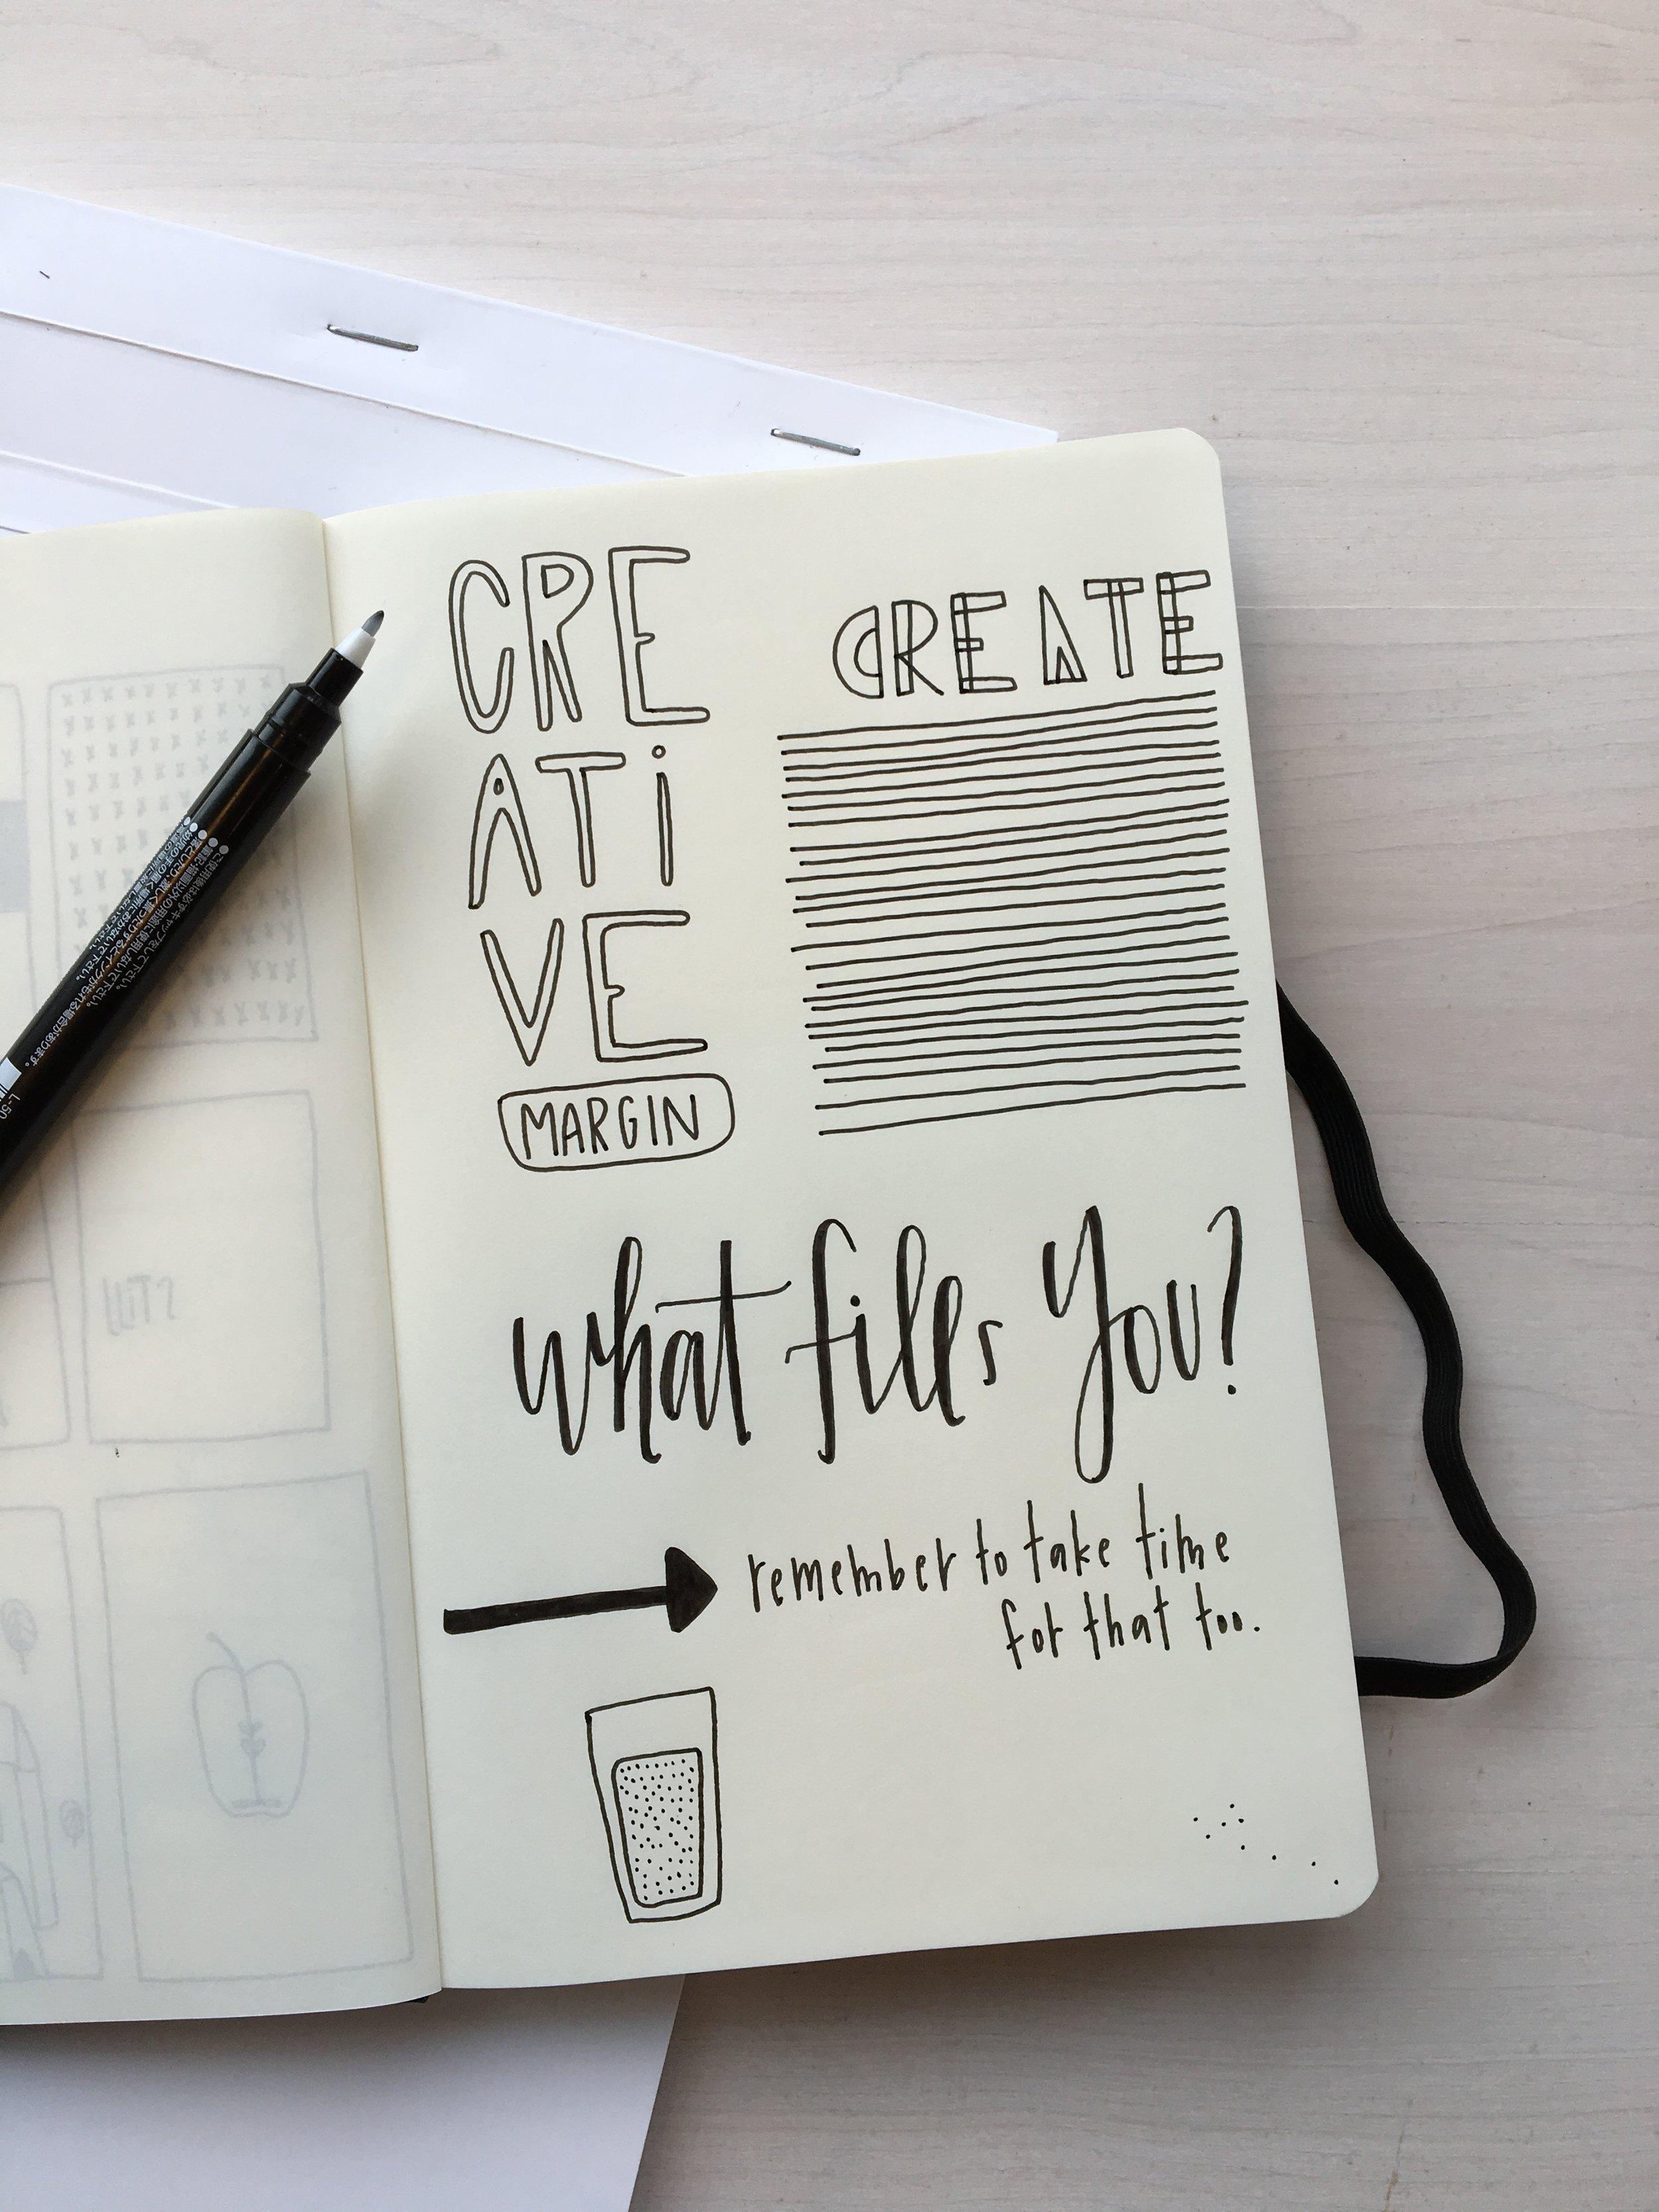 Creative Margins LIEFdesign